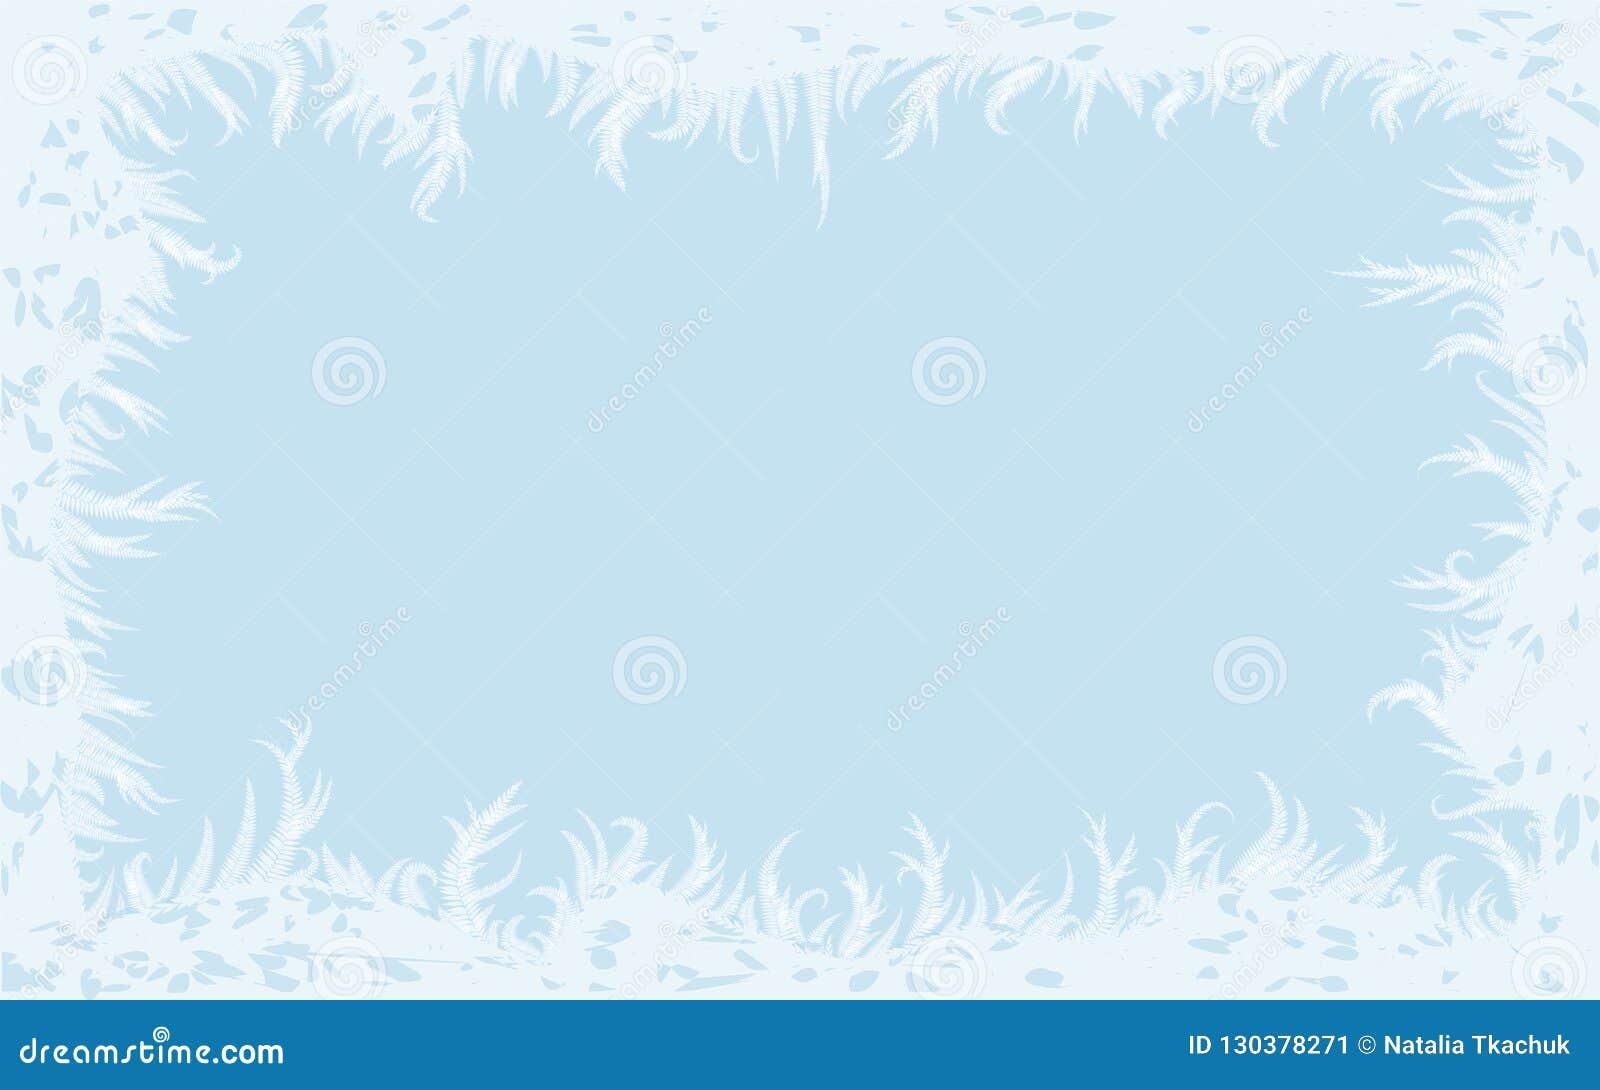 Winterrahmen mit Mattglas, Vektorillustration